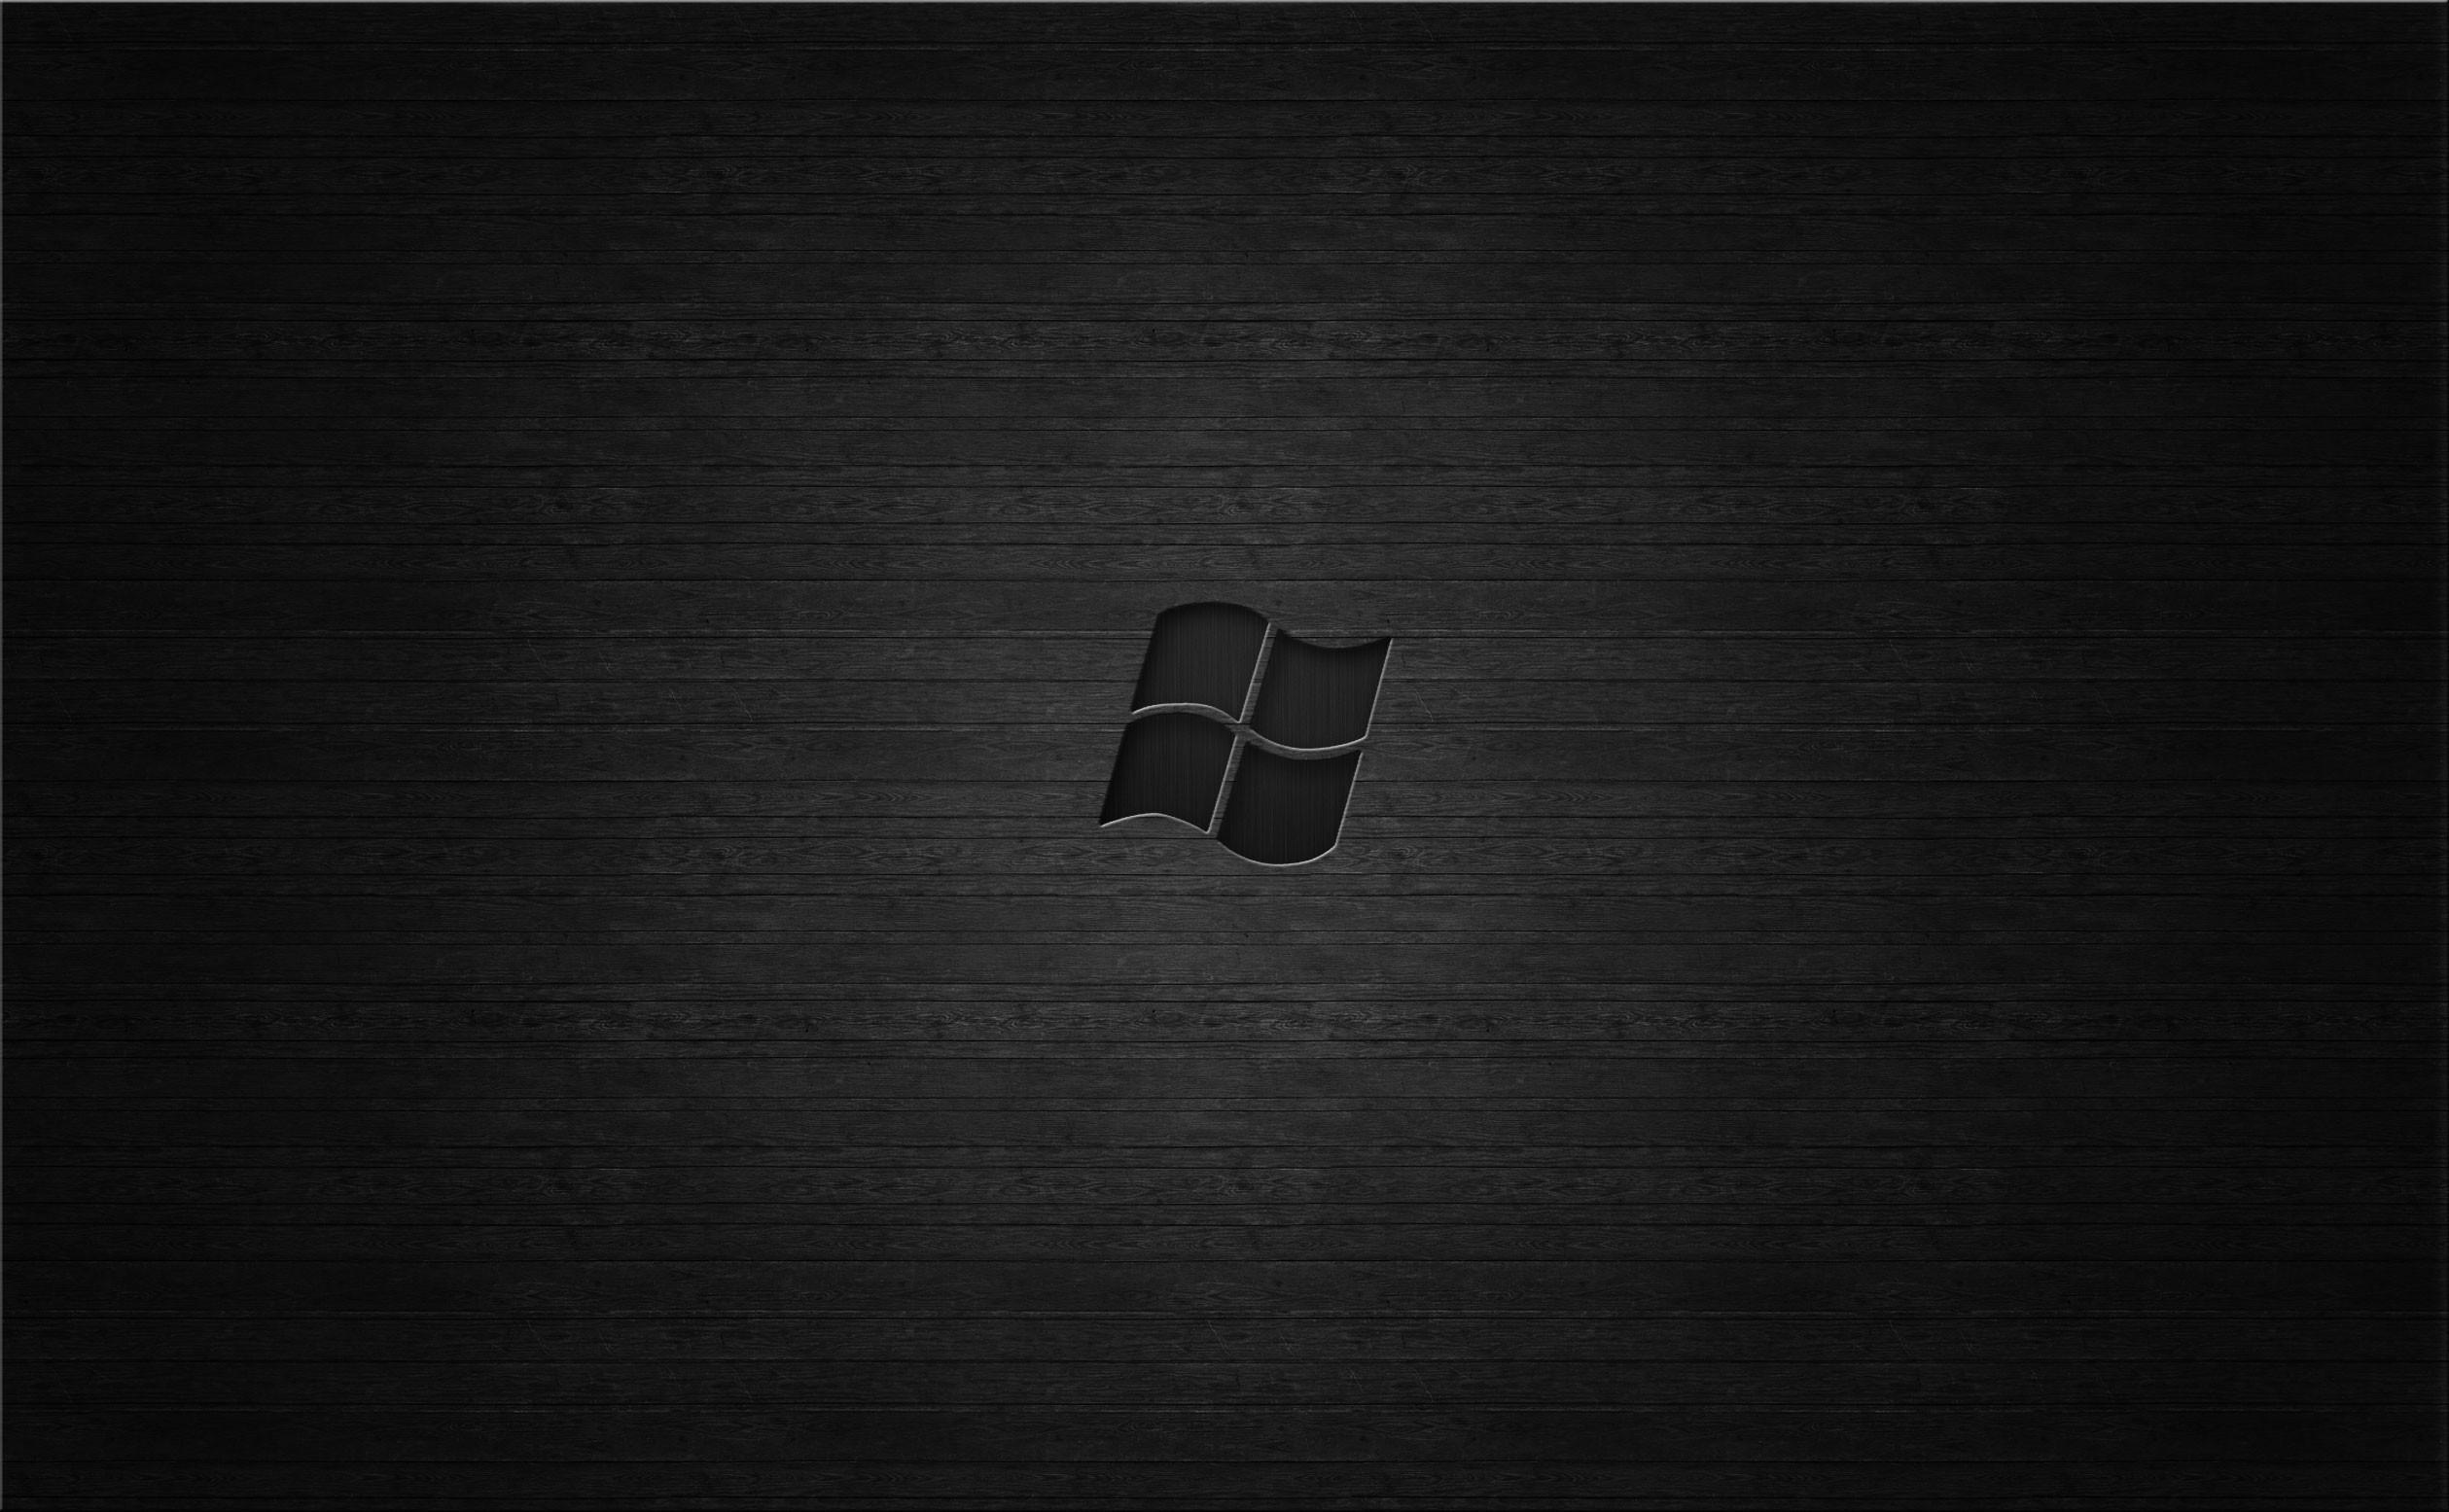 Dark Wallpaper Laptop No1 Wallpaper Hd